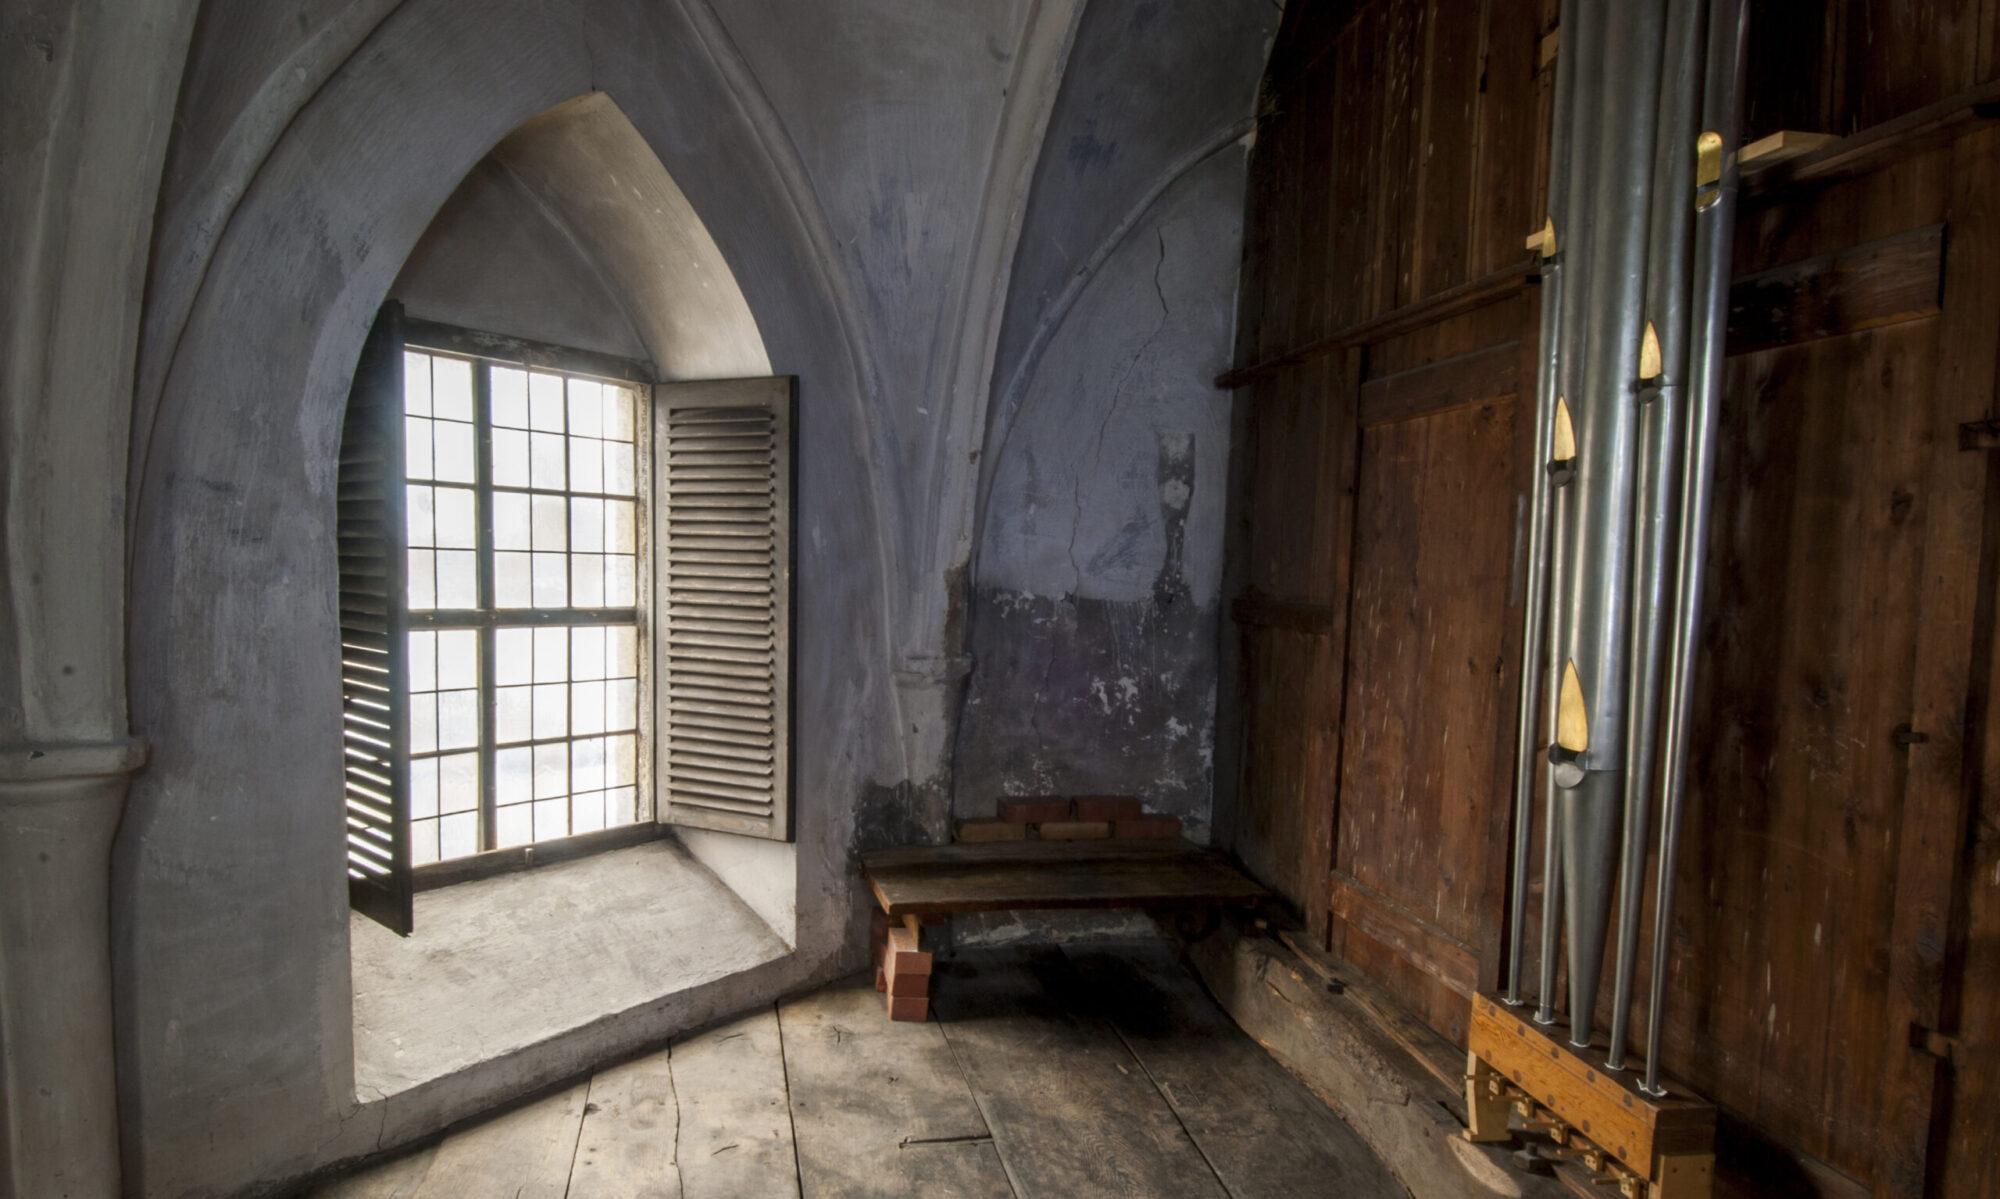 Historische Kalkantenstube der St.-Georgs-Kirche Hattingen